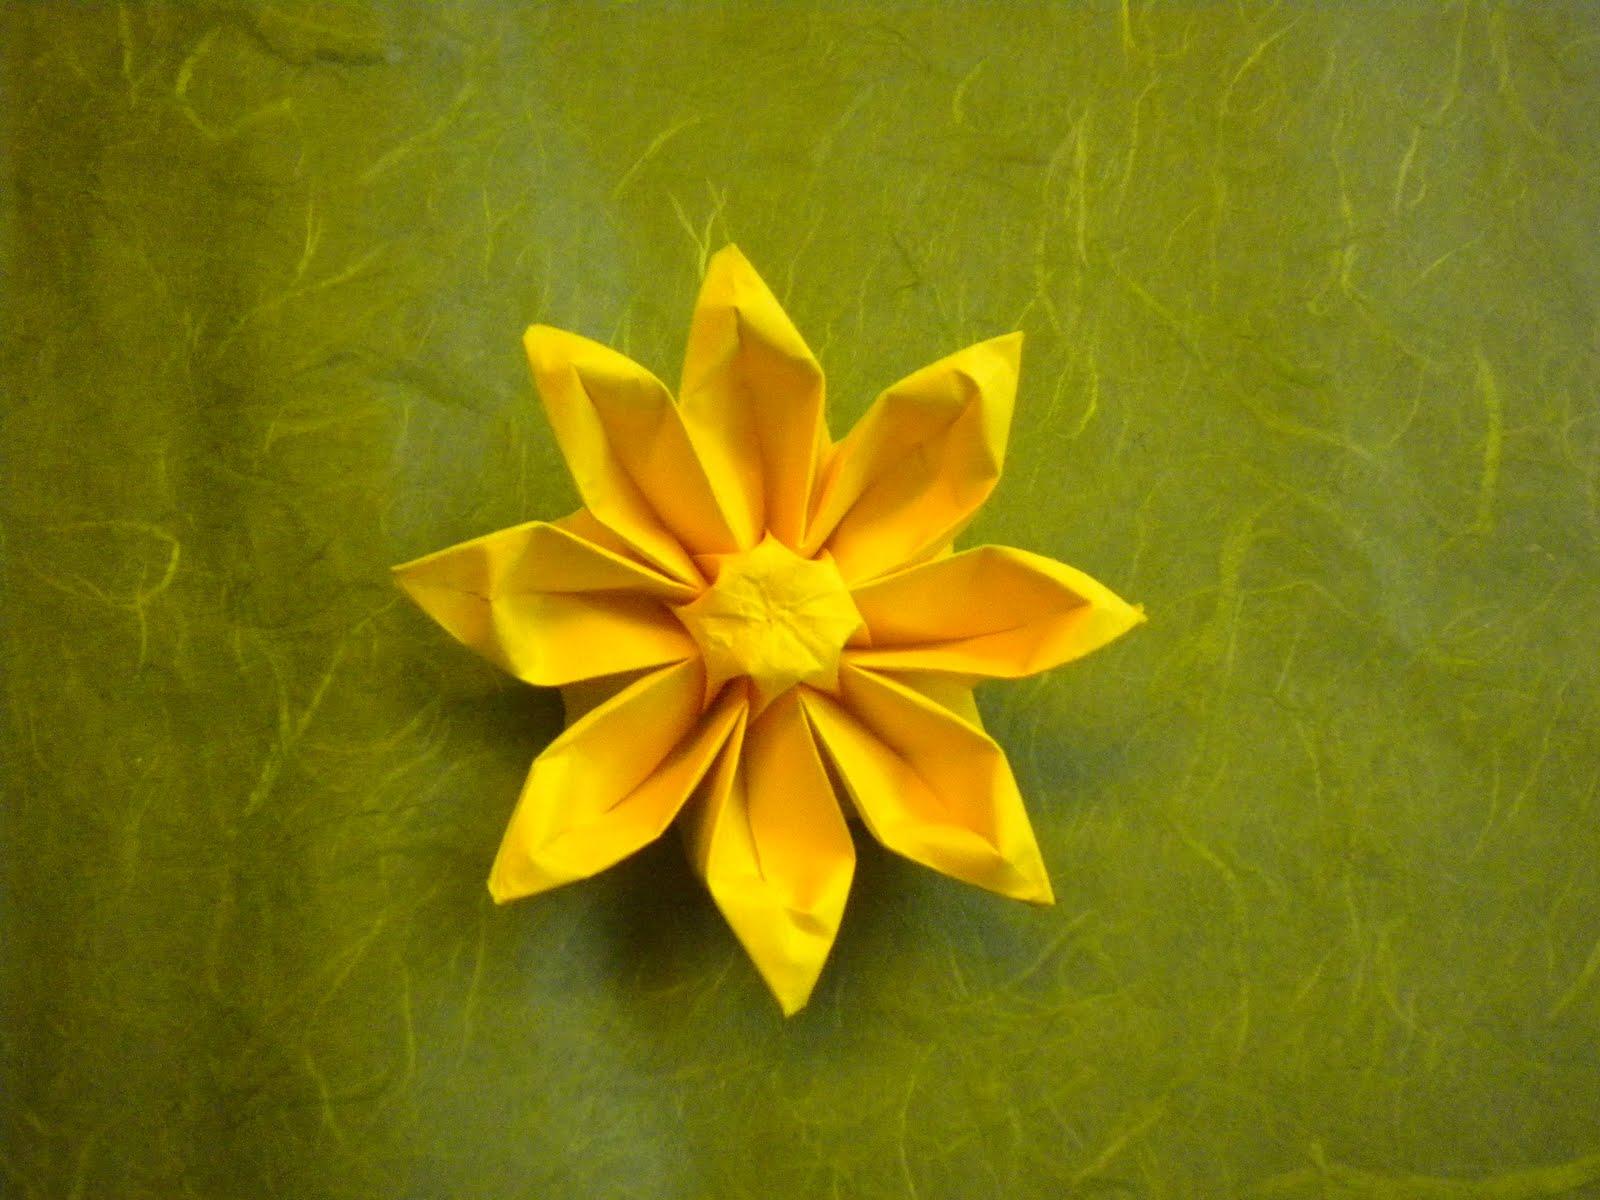 jonquille origami facile